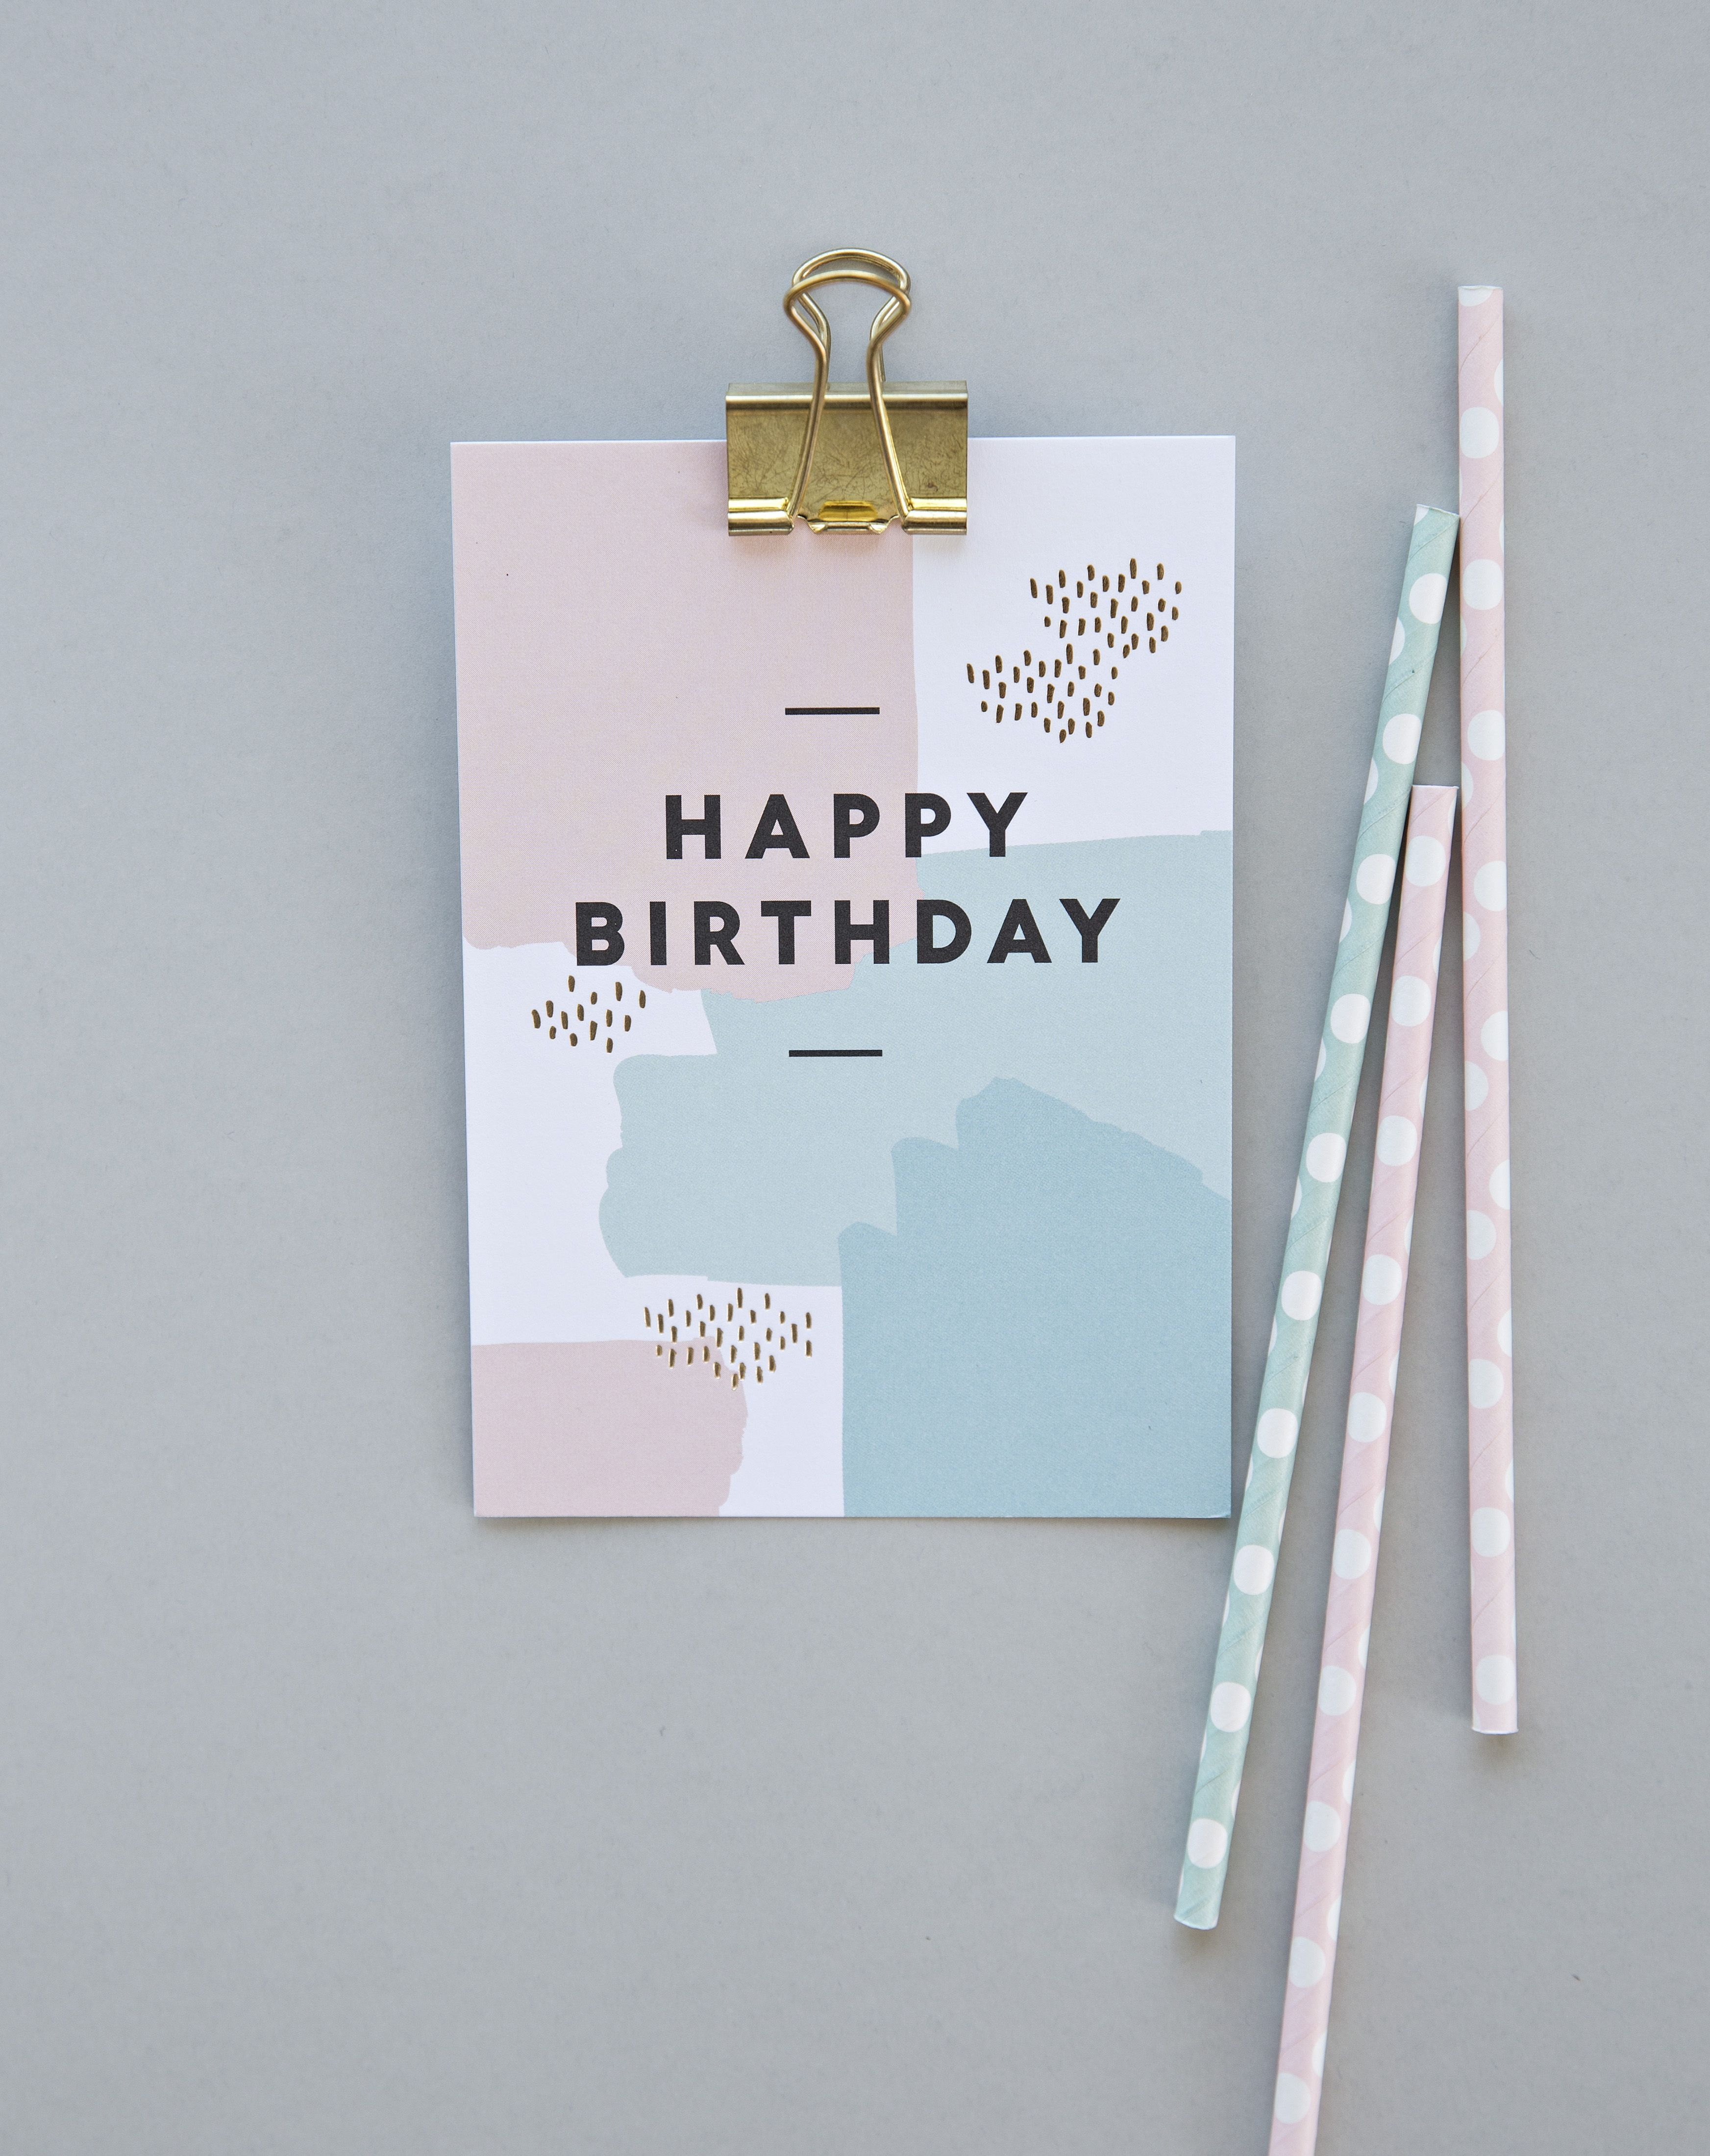 Happy Birthday Paint Splatters Postcard Timi Of Sweden Happy Birthday Card Design Happy Birthday Design Birthday Cards